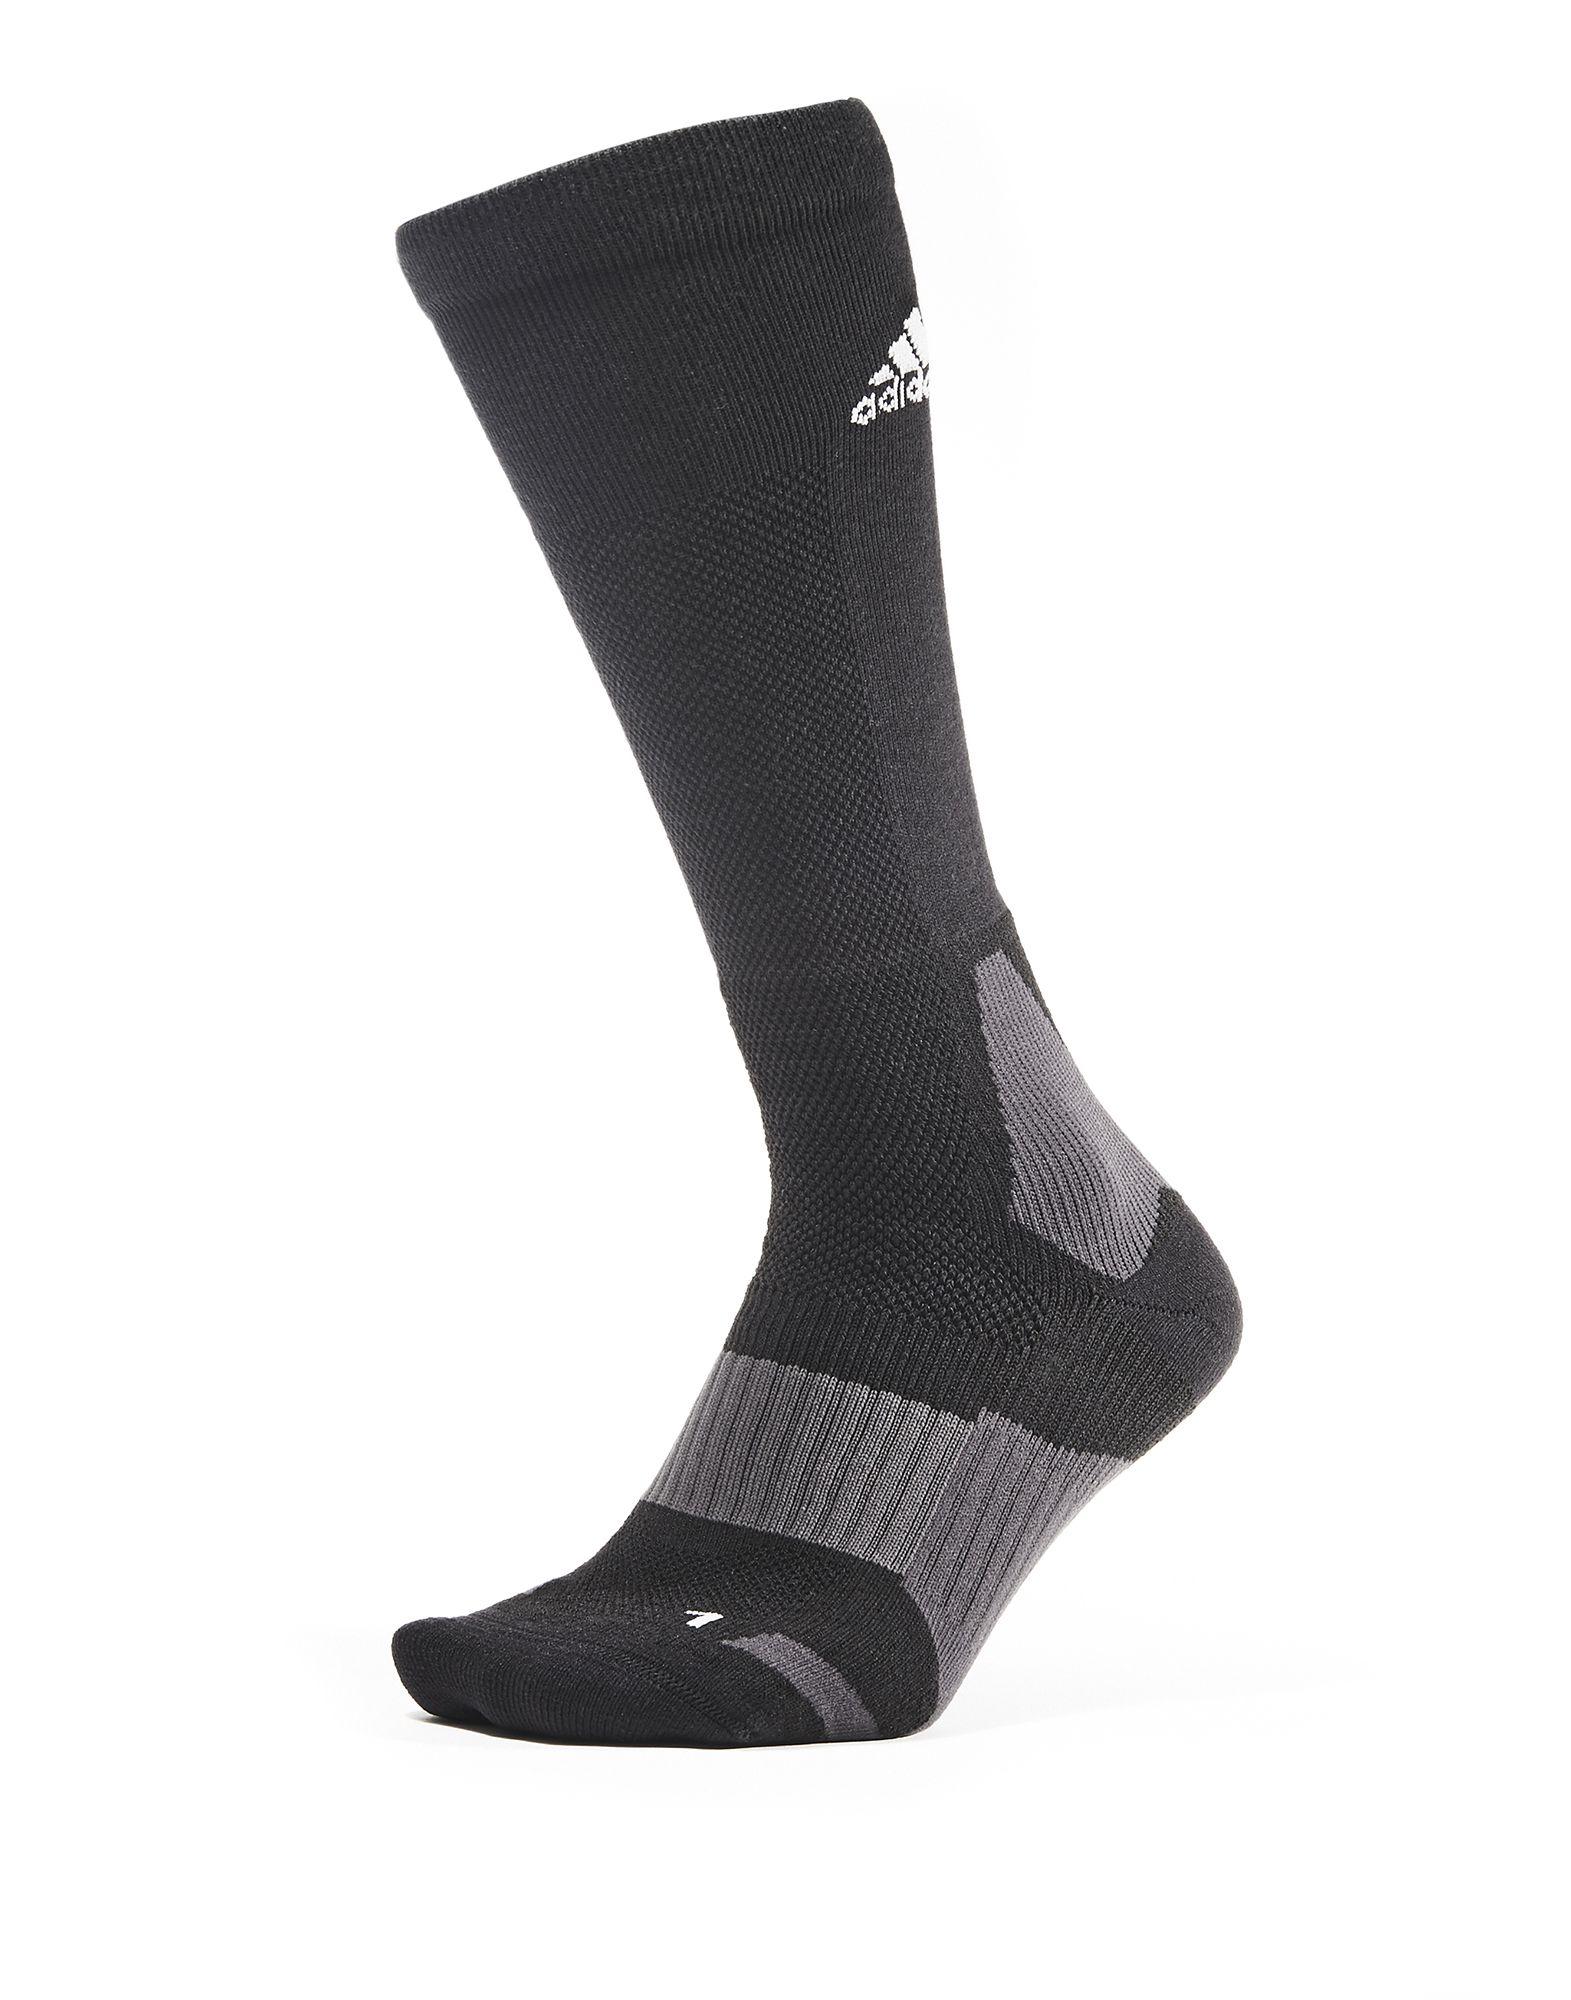 945cffa05b64f ... Y-3 SPORT Y-3 SPORT TECH SOCKS Socks Woman f ...